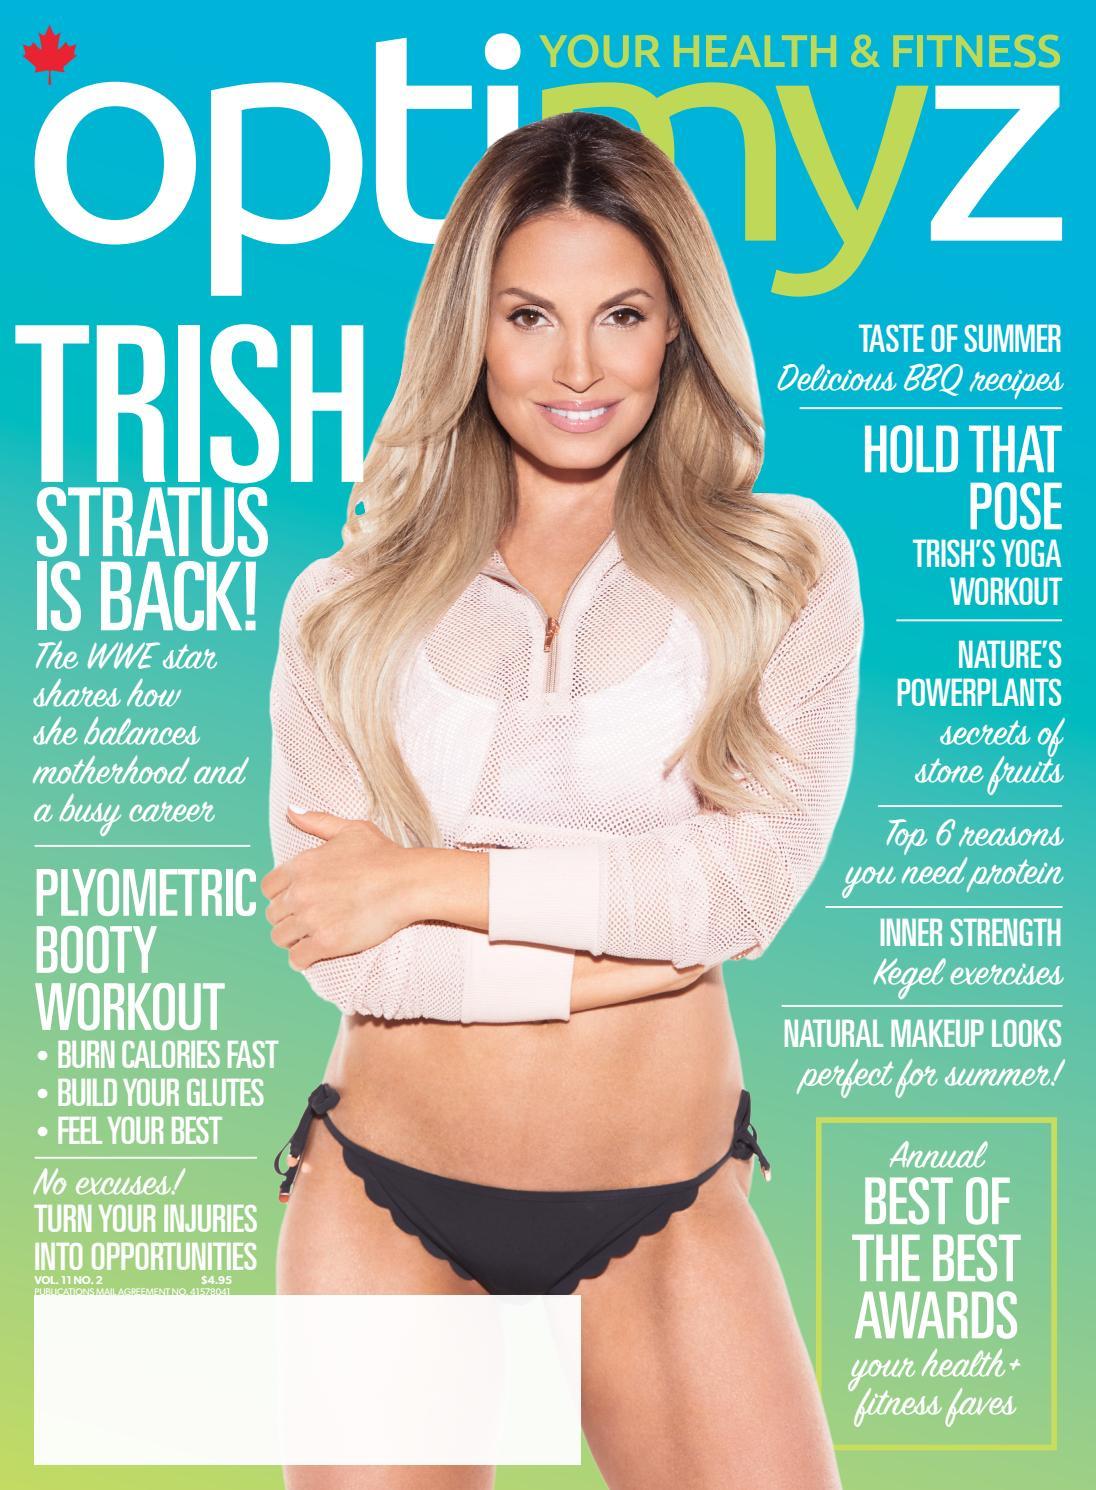 e2cdc5b7cc391 The Trish Stratus Issue (June July 2018) Optimyz Magazine by OptimyzMag -  issuu